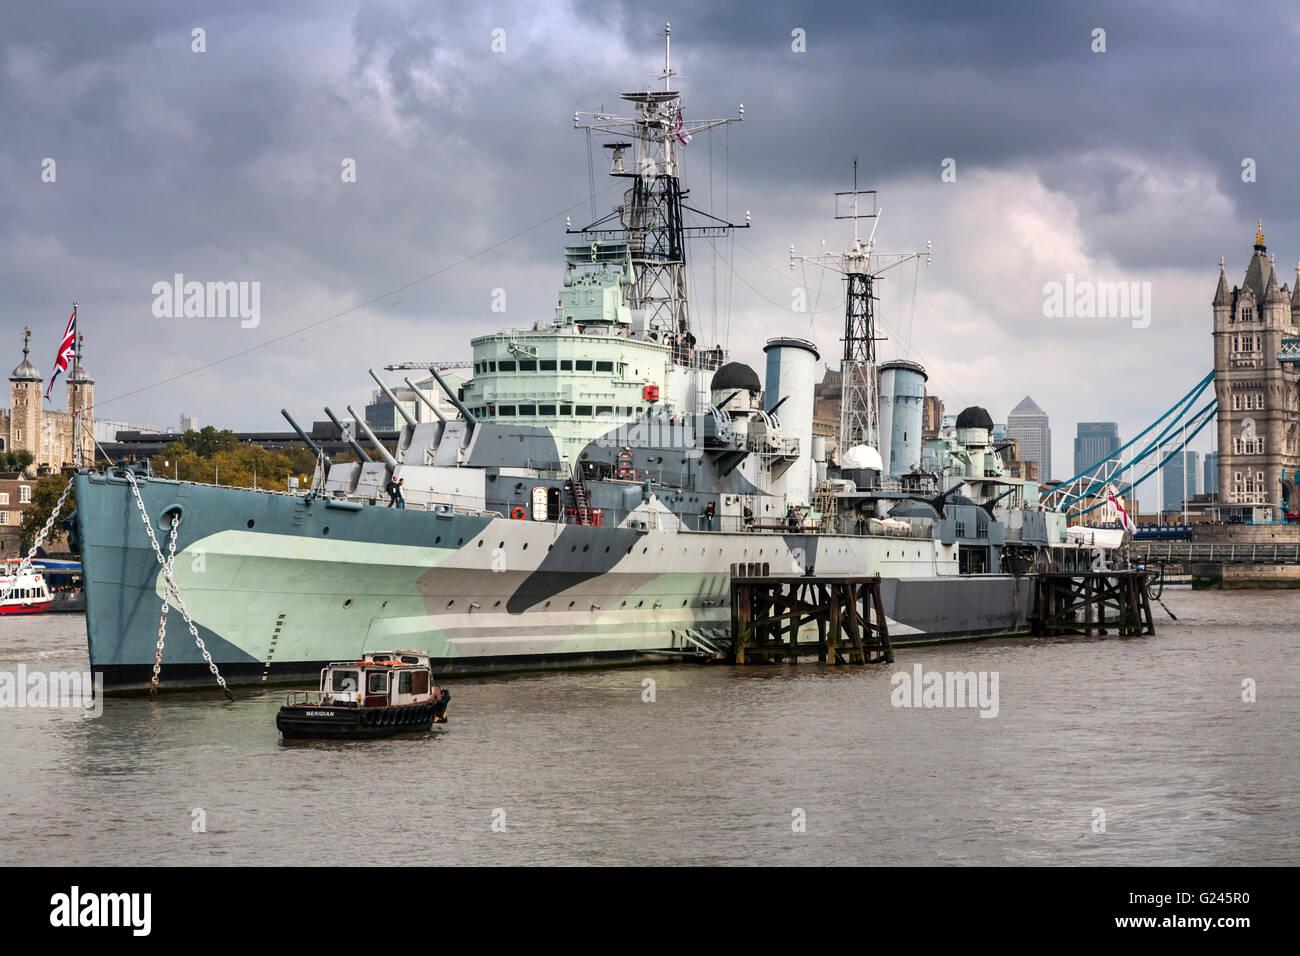 HMS Belfast Museum Warship, South Bank, Southwark, London, England. - Stock Image